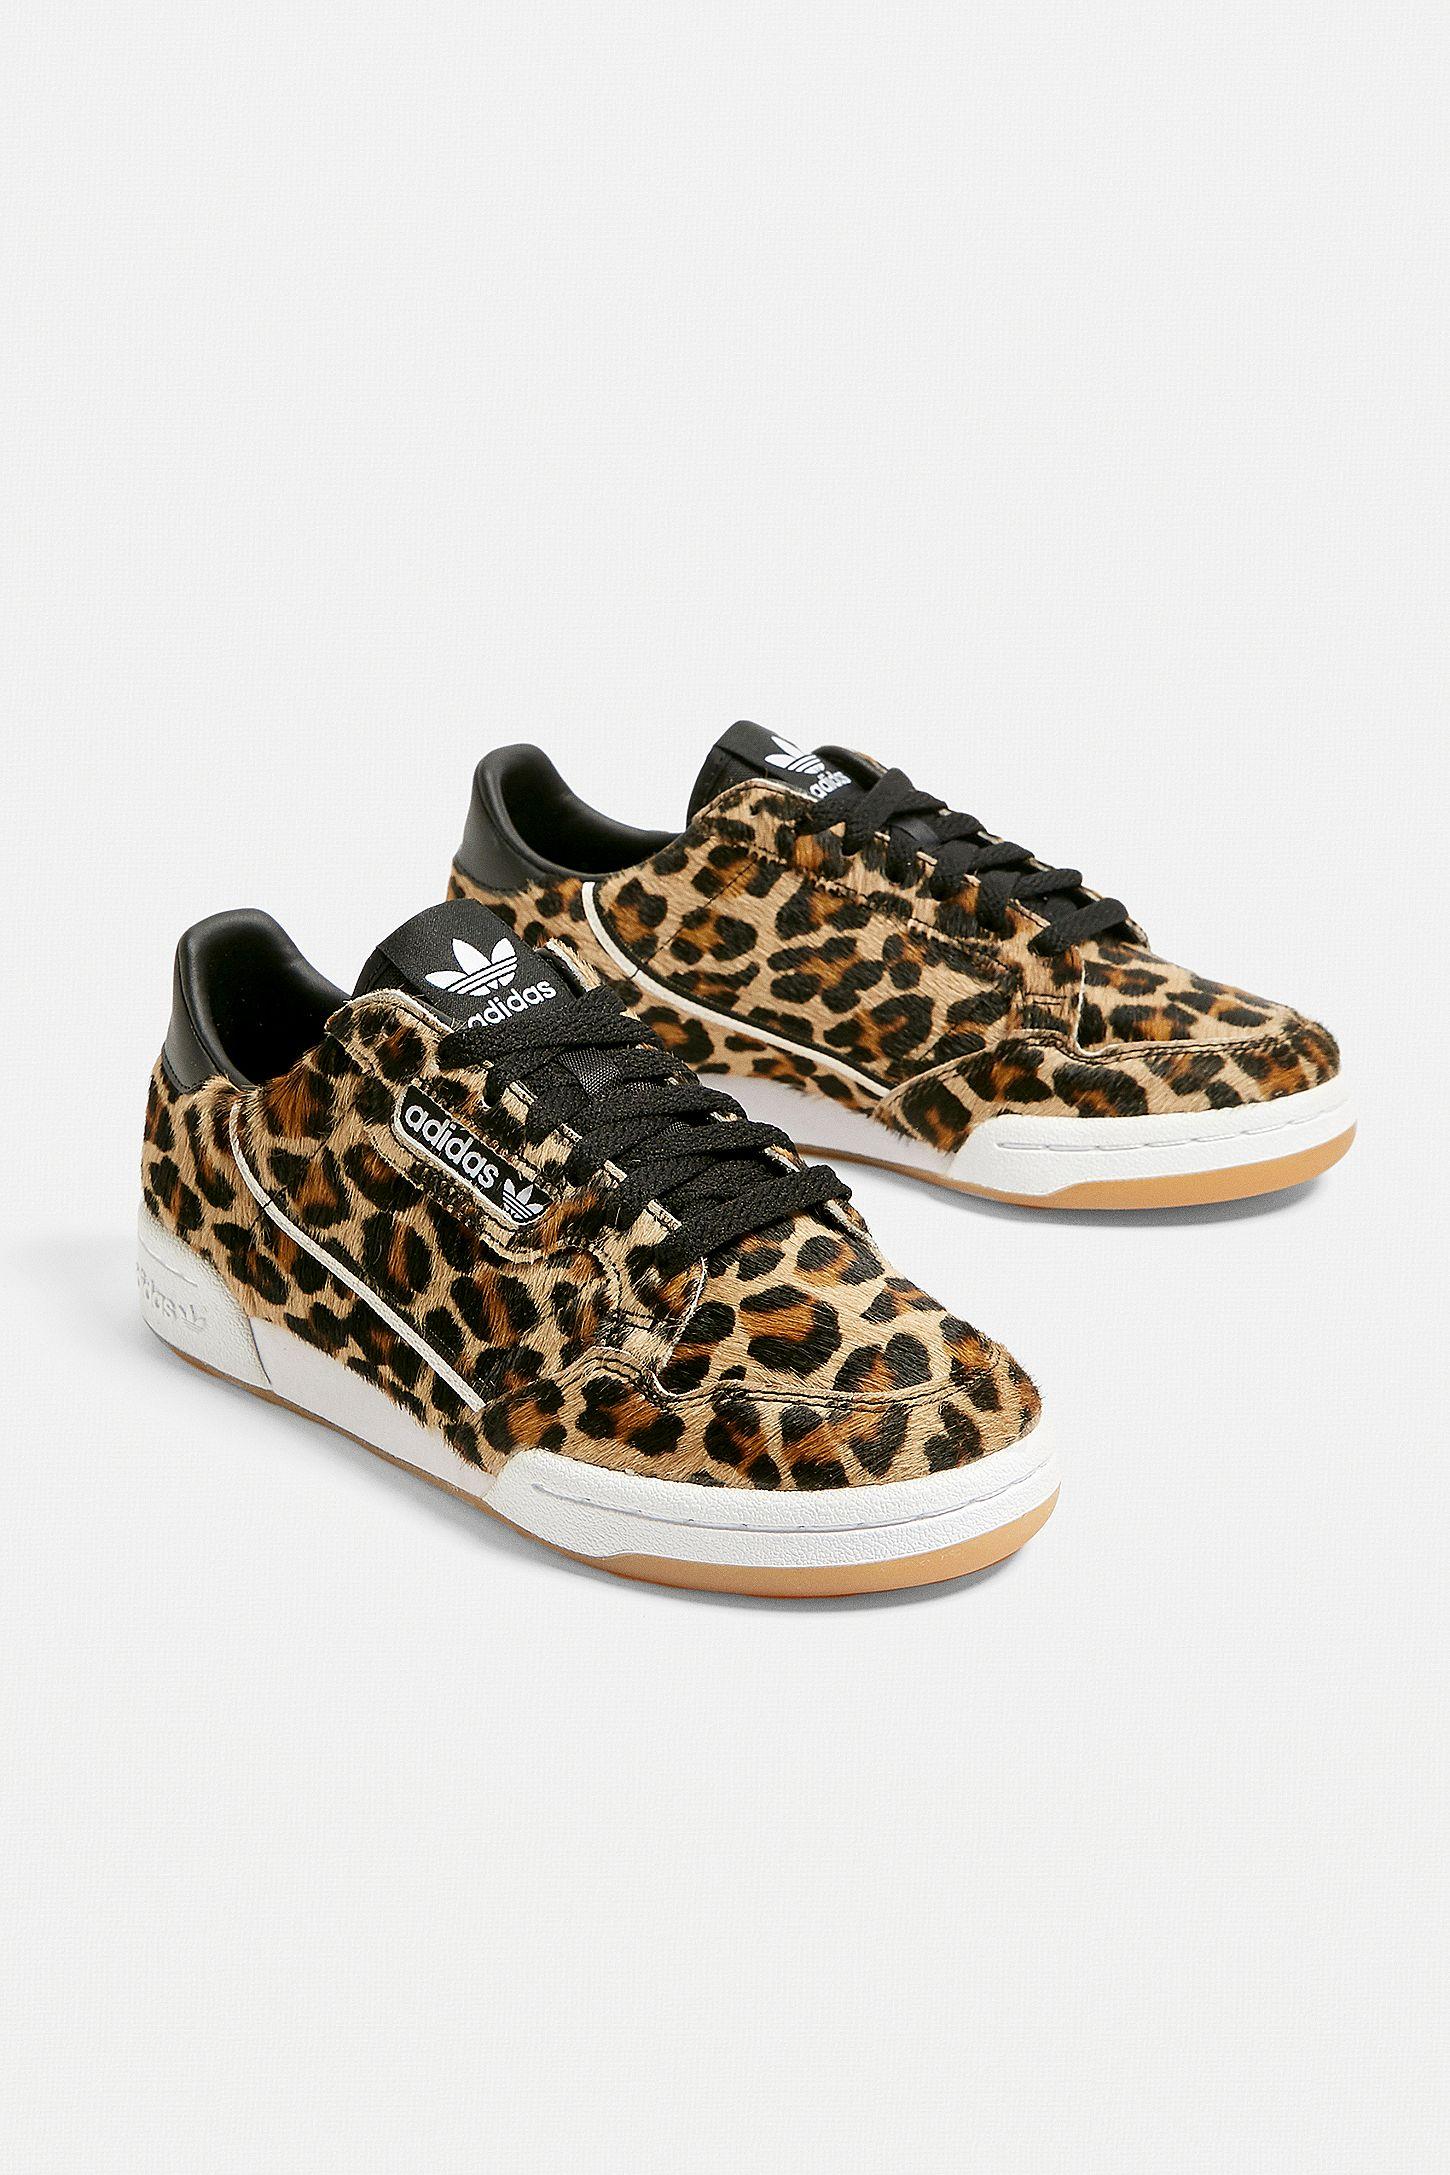 adidas Originals Continental Leopard Print Trainers